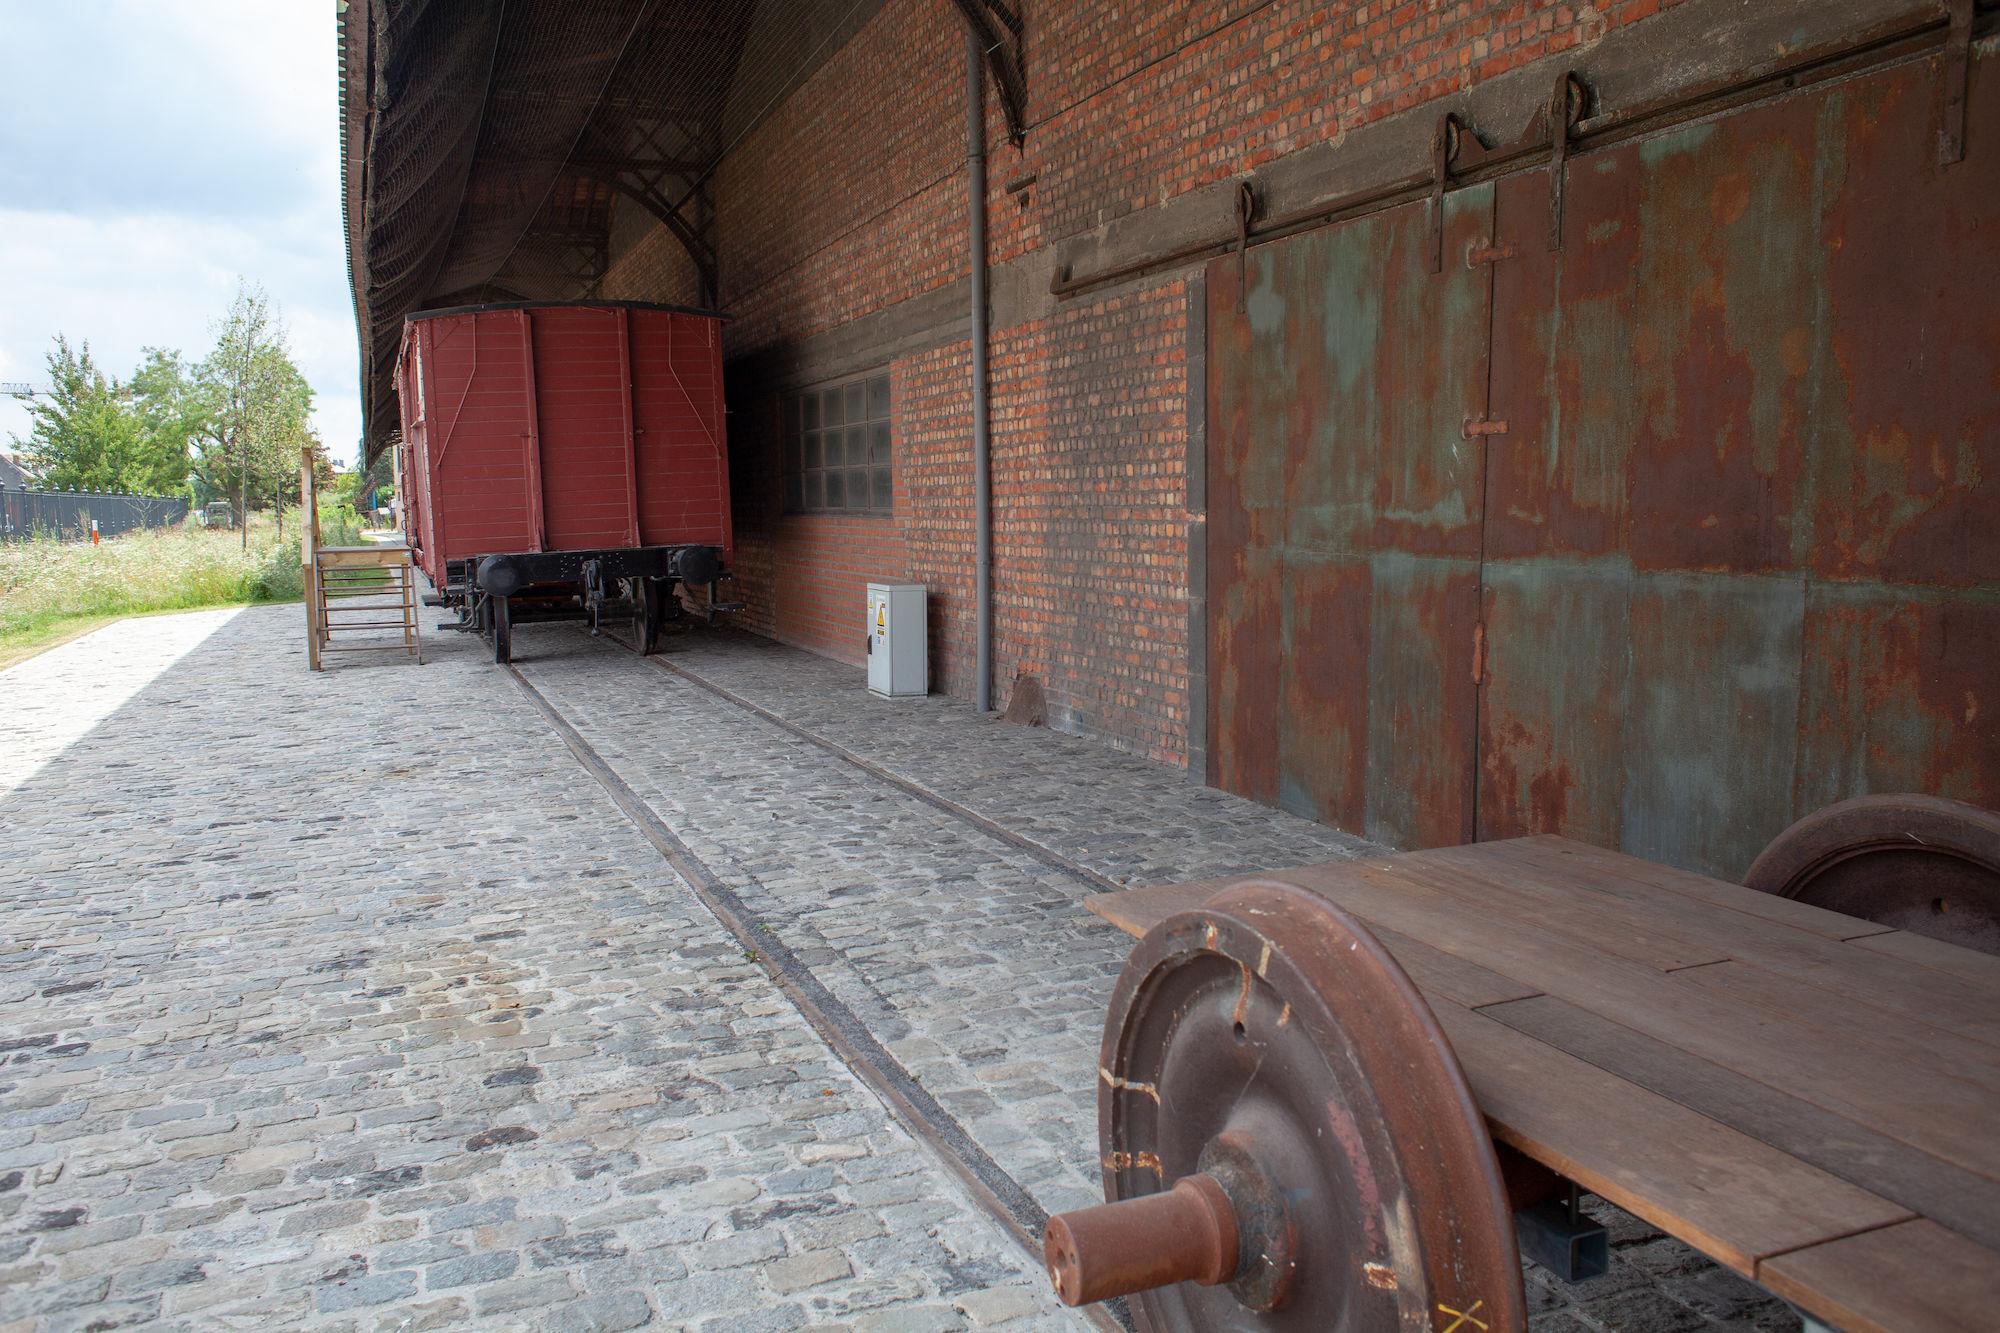 2019-07-02 Muide Meulestede prospectie Wannes_stadsvernieuwing_IMG_0396-3.jpg